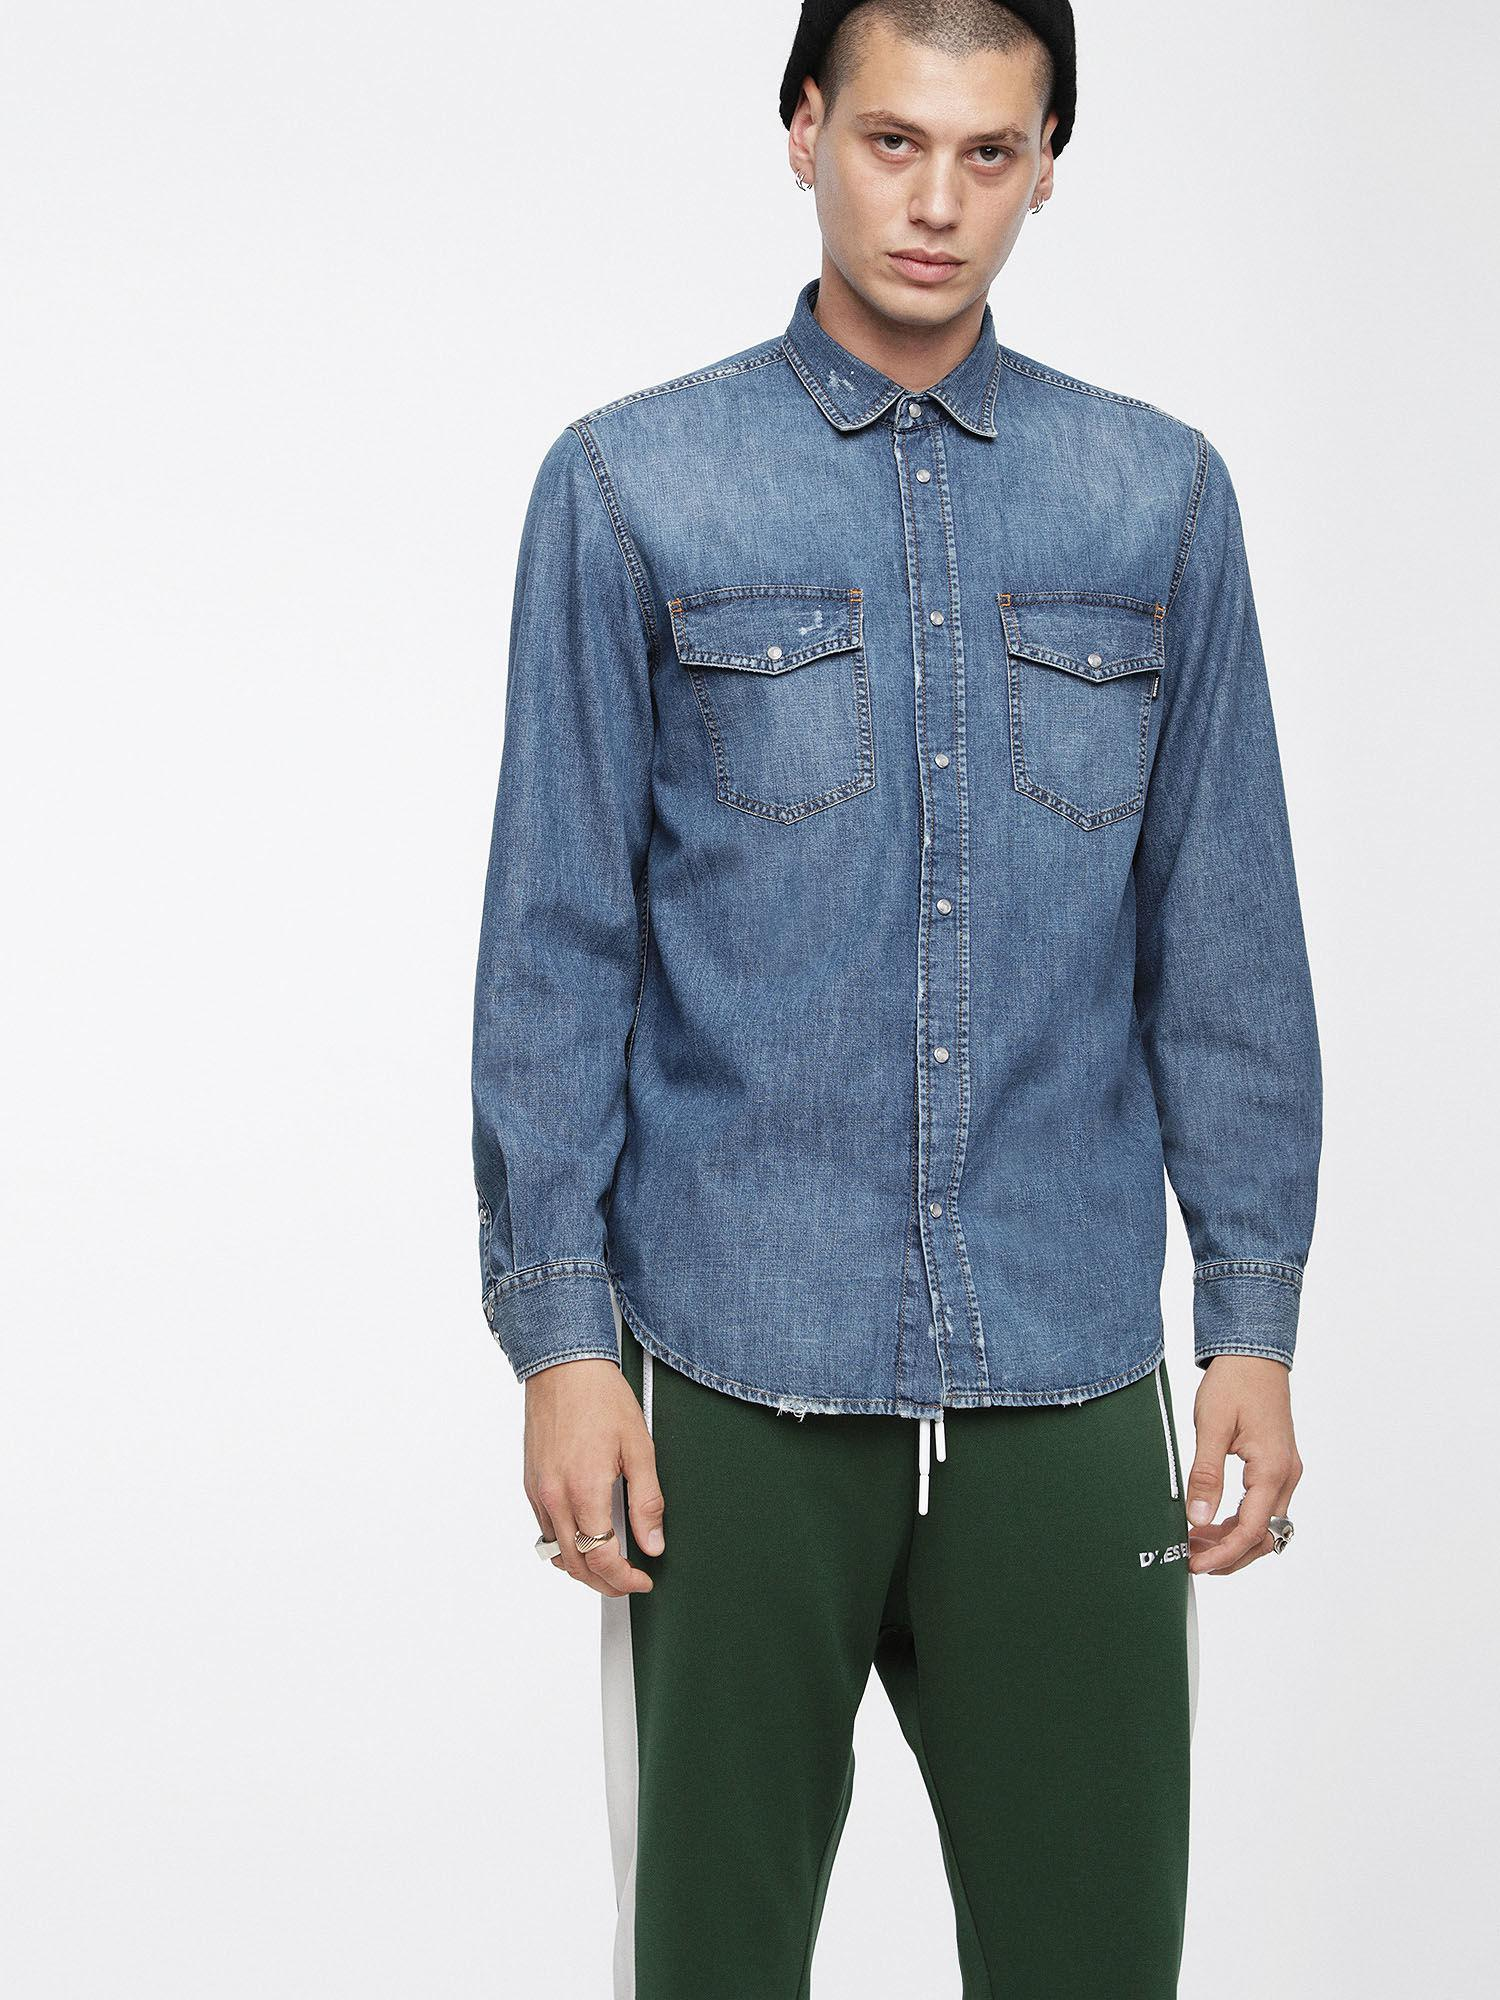 b13a9085e3 DIESEL - Blue Vintage Denim Shirt for Men - Lyst. View fullscreen